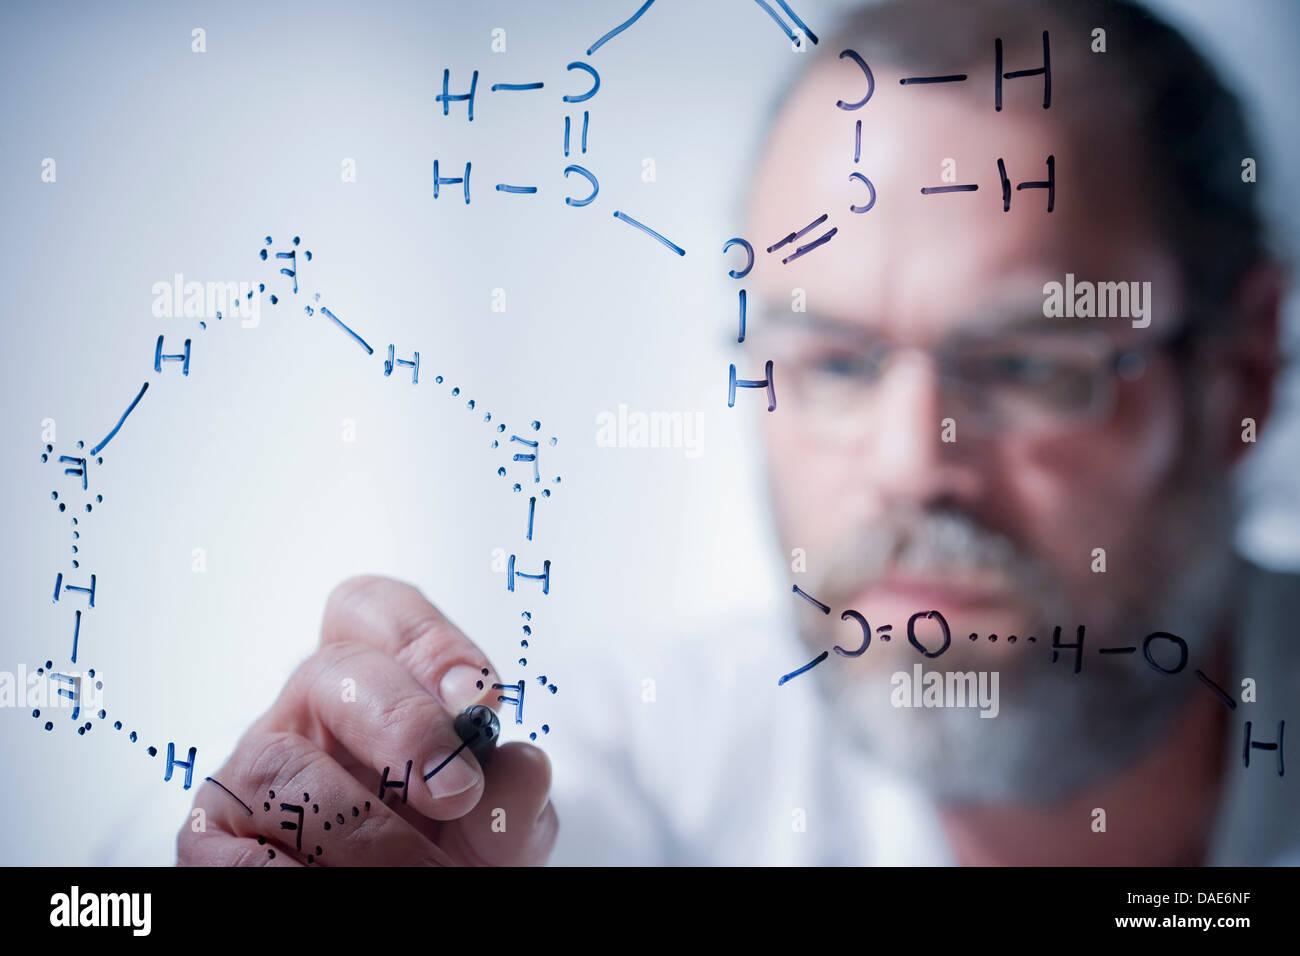 Scientist writing scientific symbols on glass - Stock Image